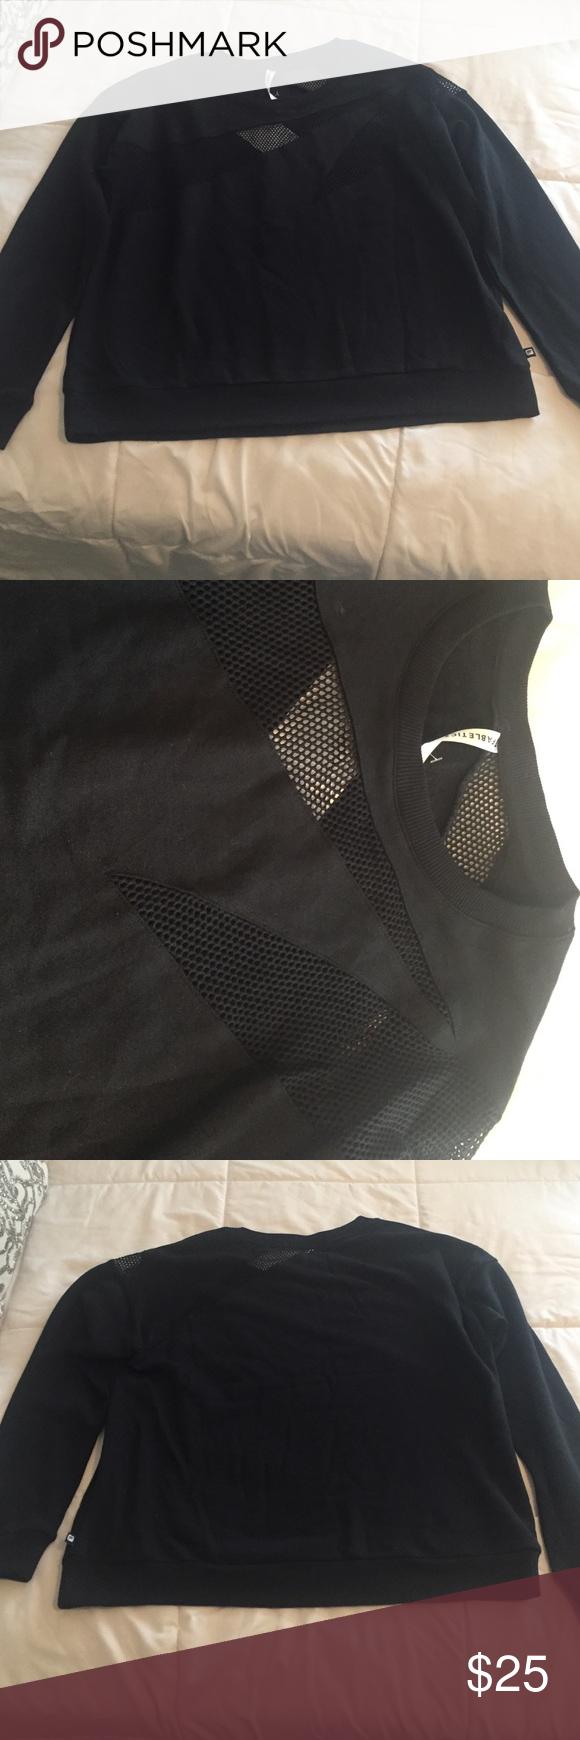 Black Fabletics sweatshirt Black Fabletics light sweatshirt with mesh detailing on the front and back. Brand new, never worn! Fabletics Tops Sweatshirts & Hoodies